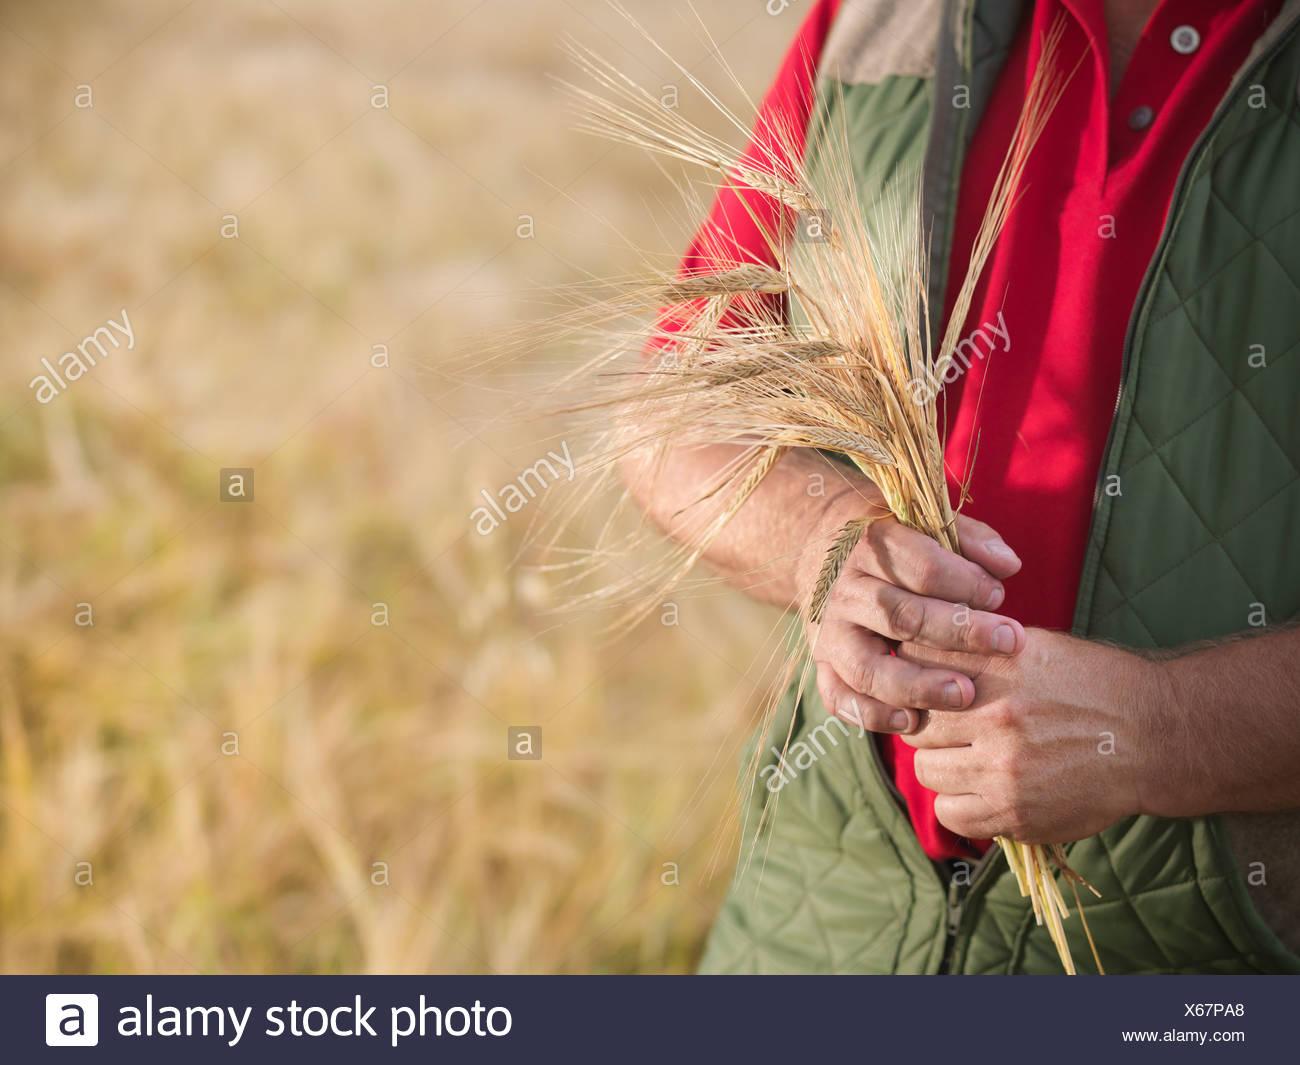 Farmer holding barley stalks in field - Stock Image